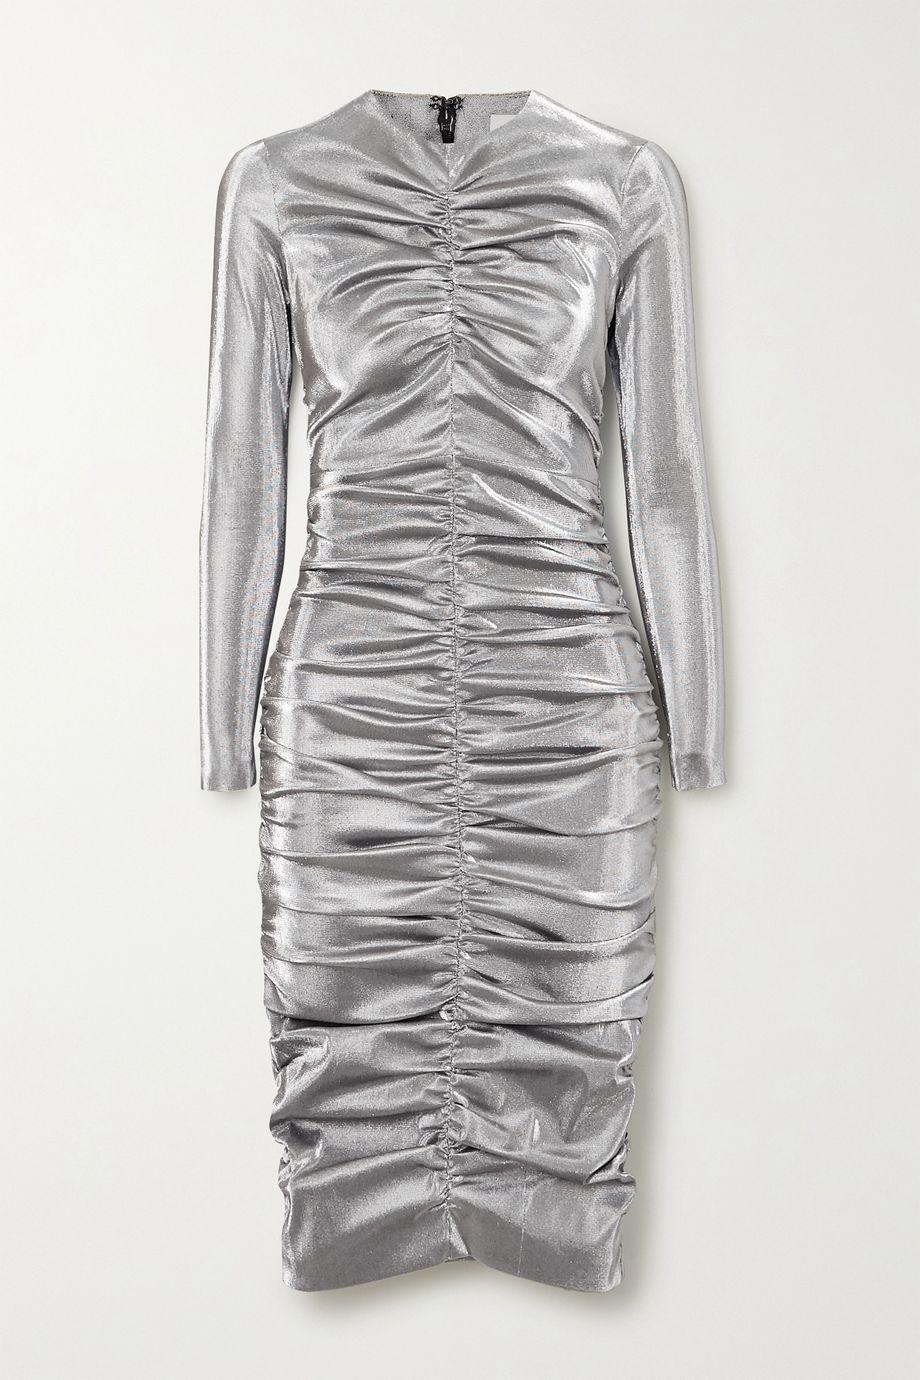 AREA Ruched Lurex dress